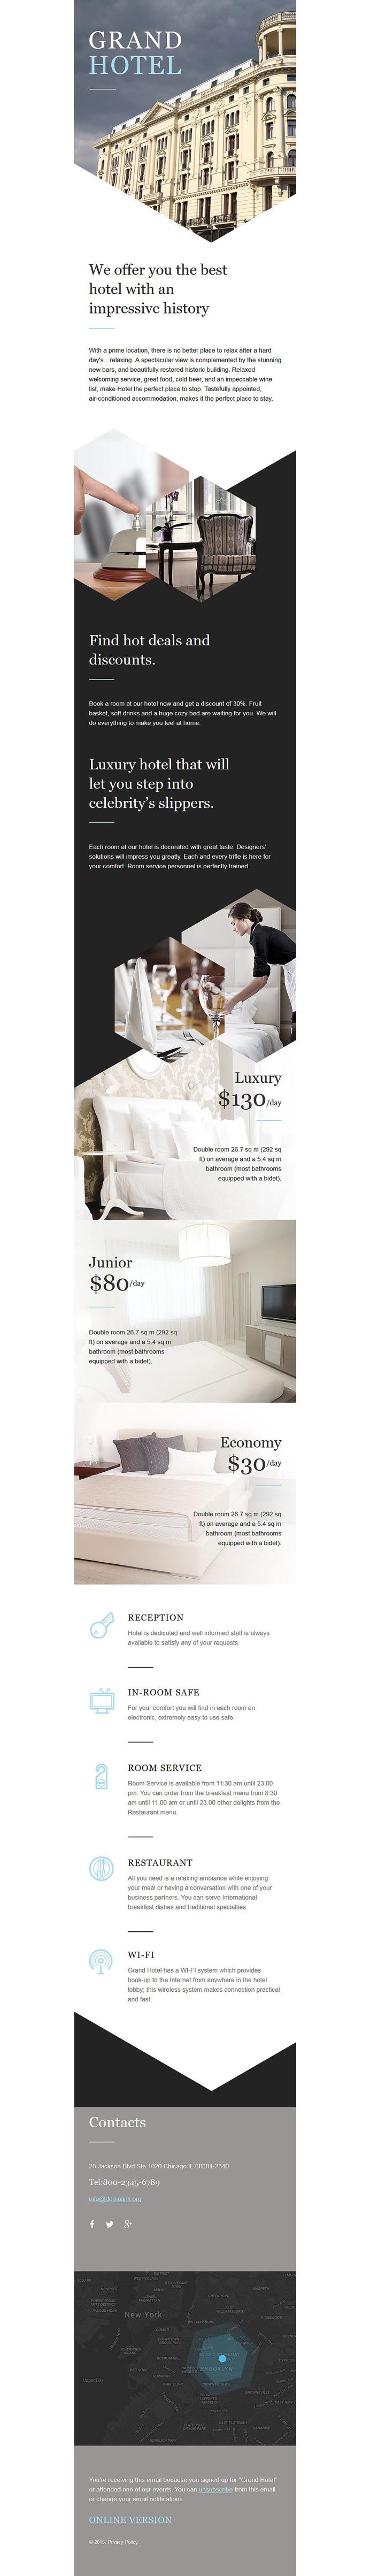 Grand Hotel Responsive Newsletter Template